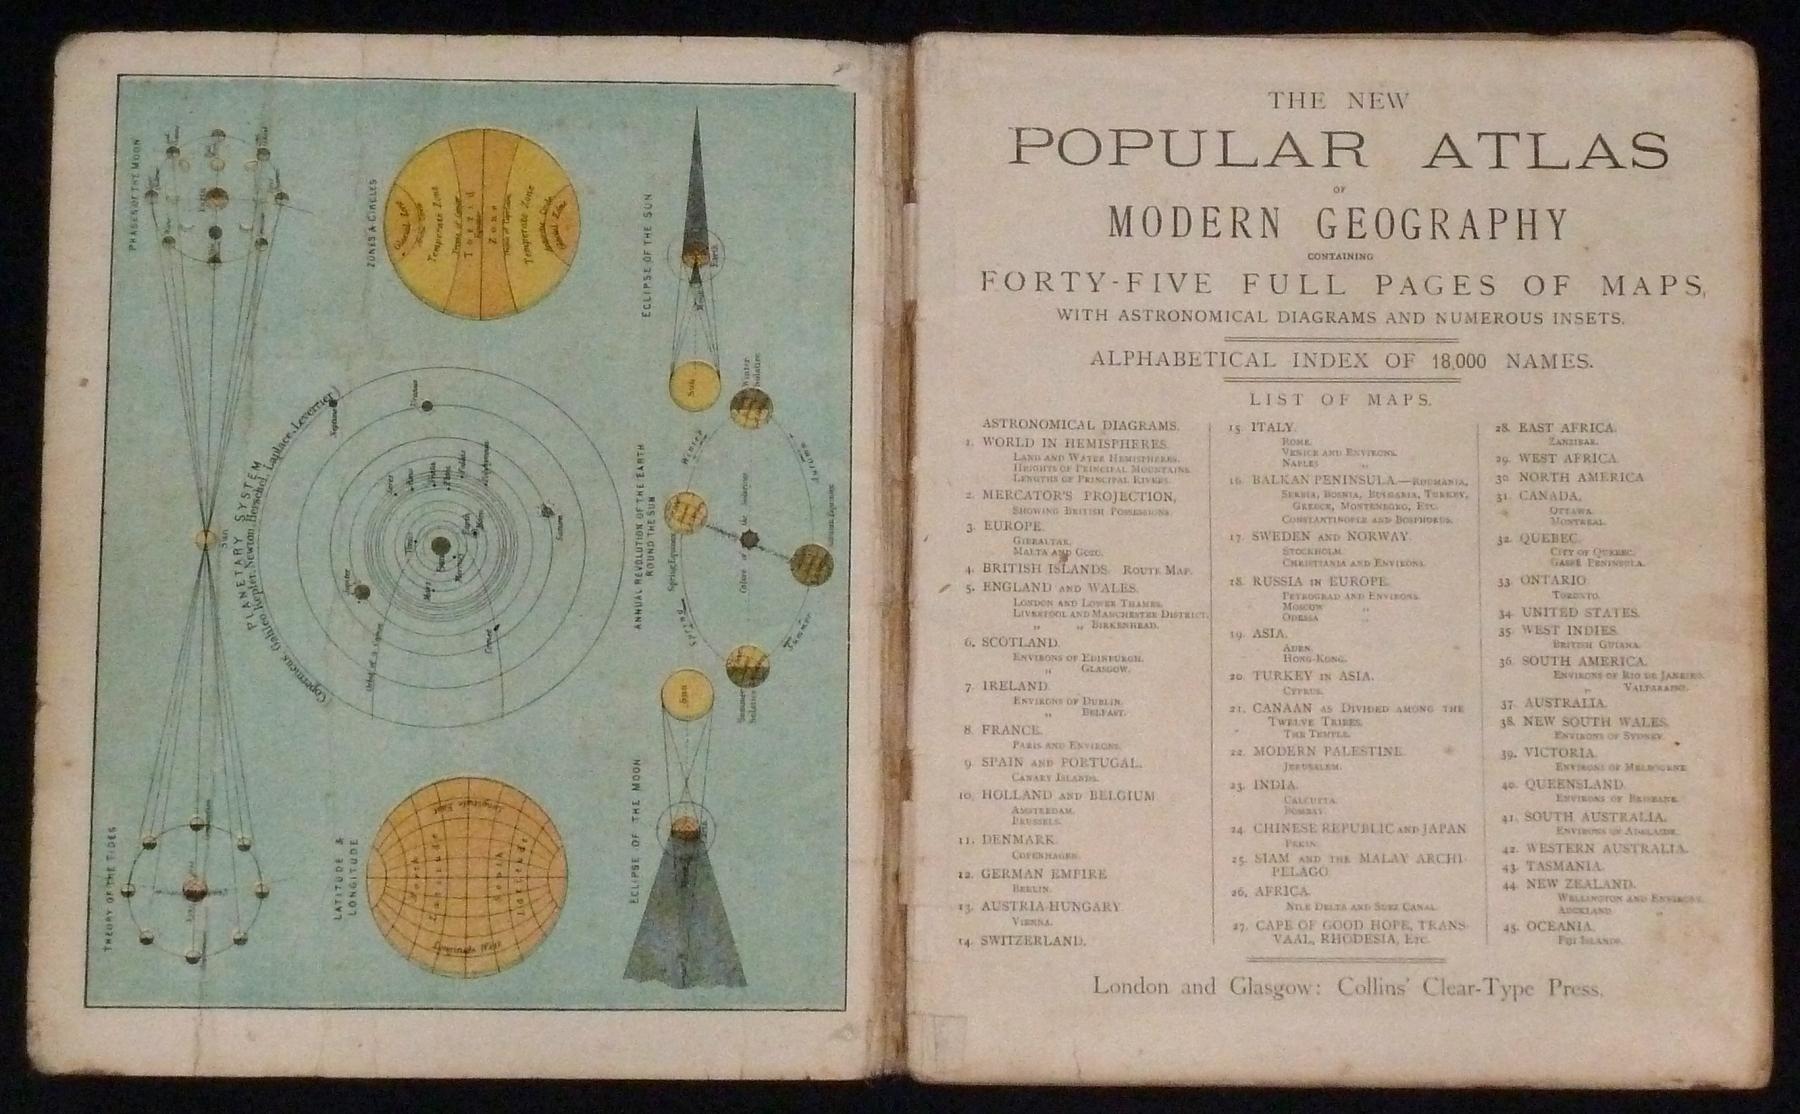 Collins' Popular Atlas